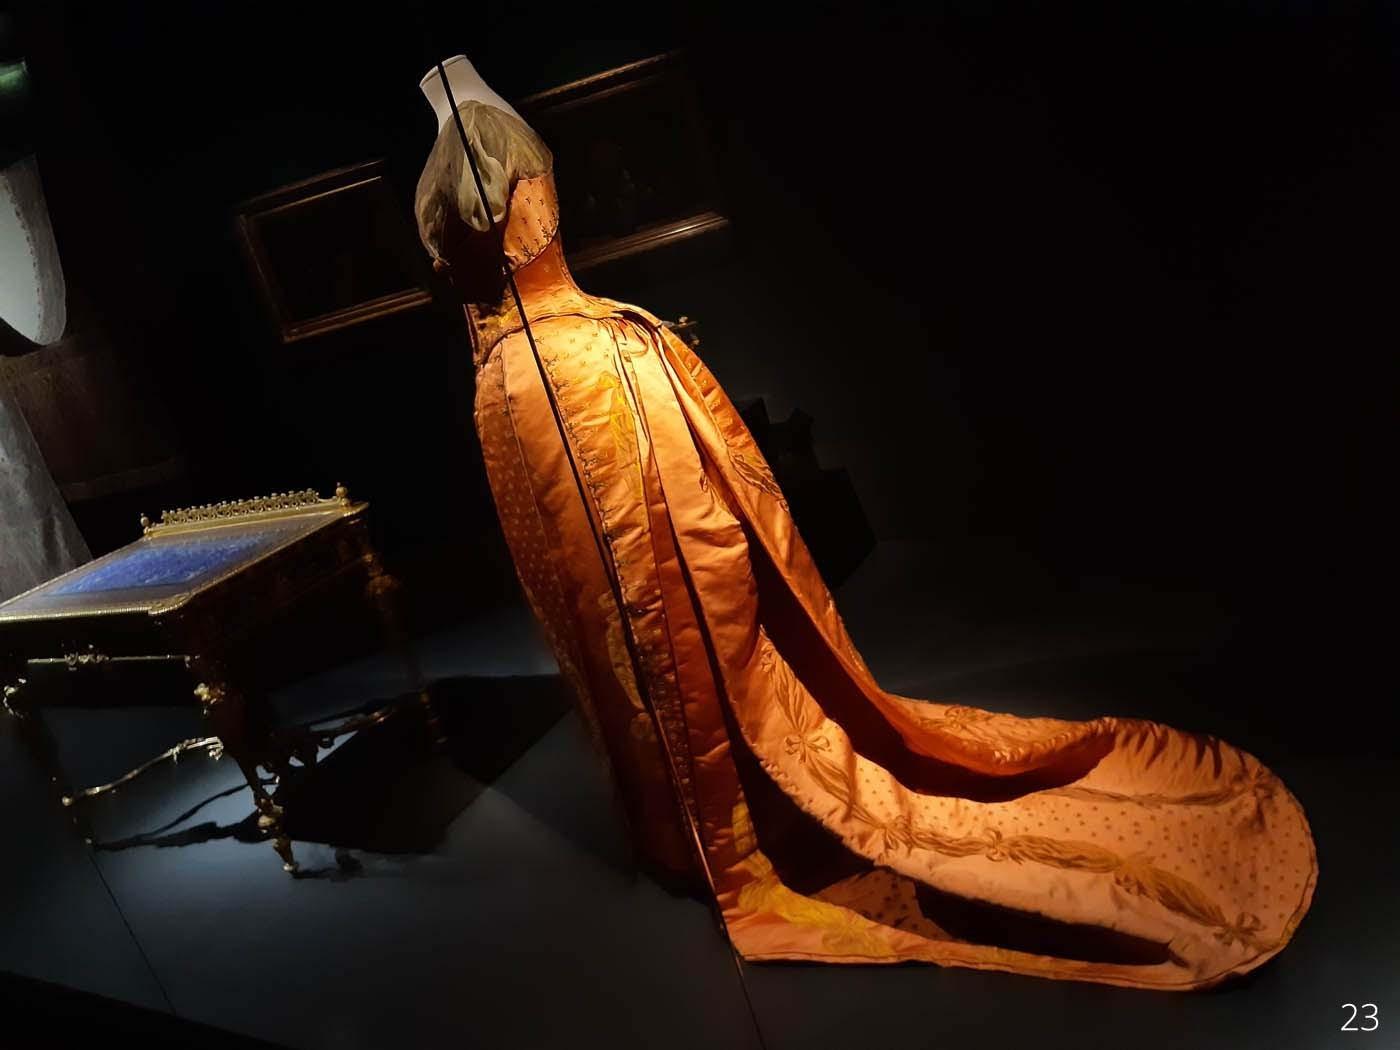 LUXES-_-MAD_B-44-Robe-du-soir-Worth-1885